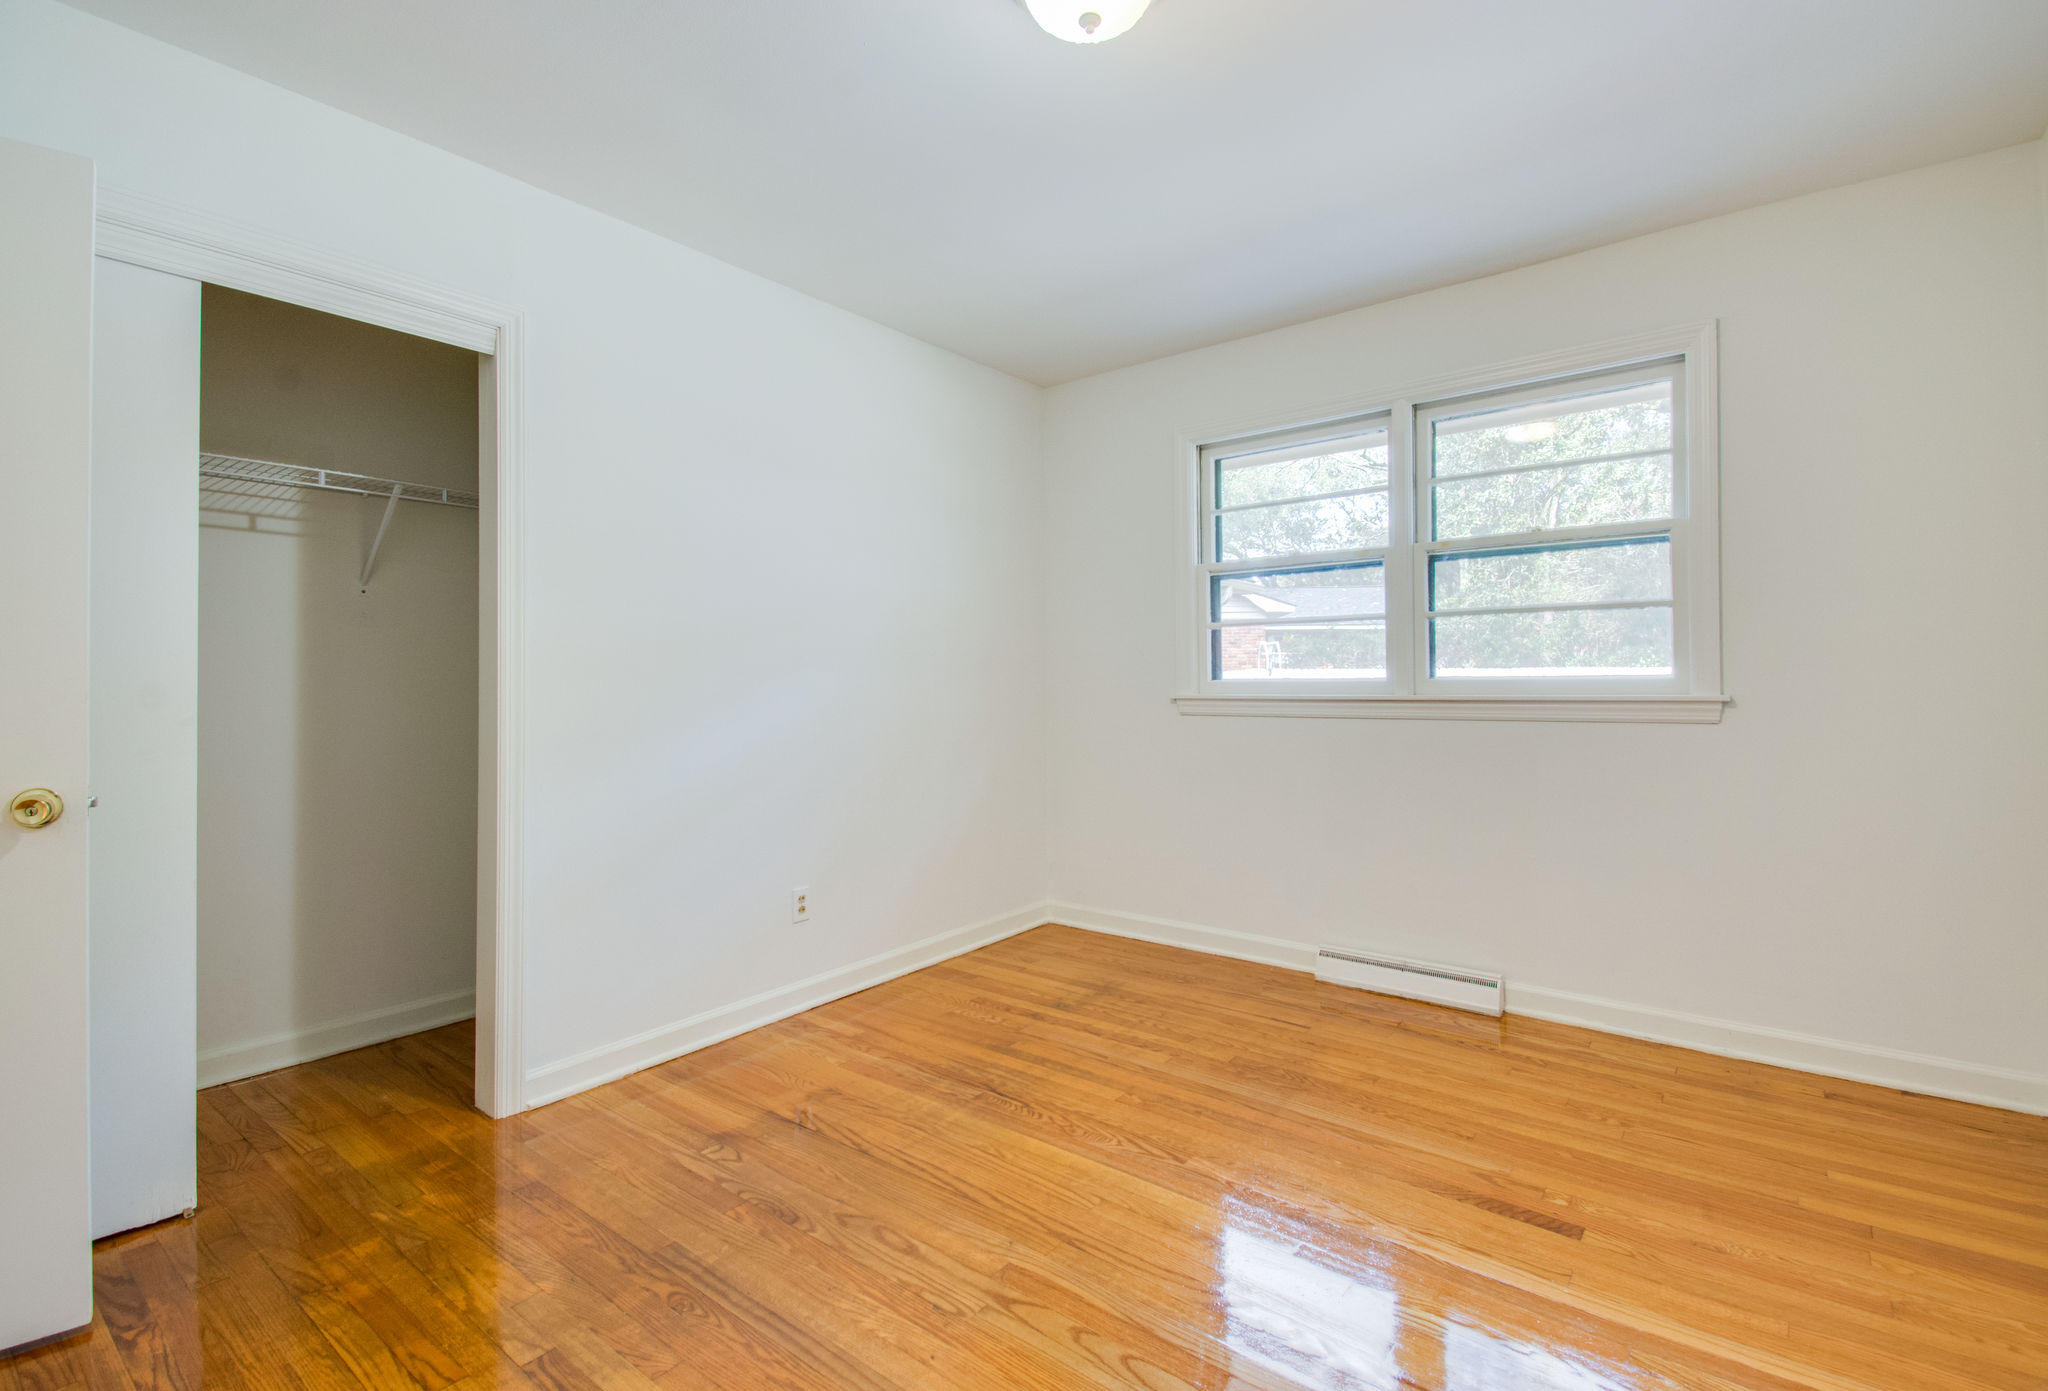 Northbridge Terrace Homes For Sale - 1114 Northbridge, Charleston, SC - 8